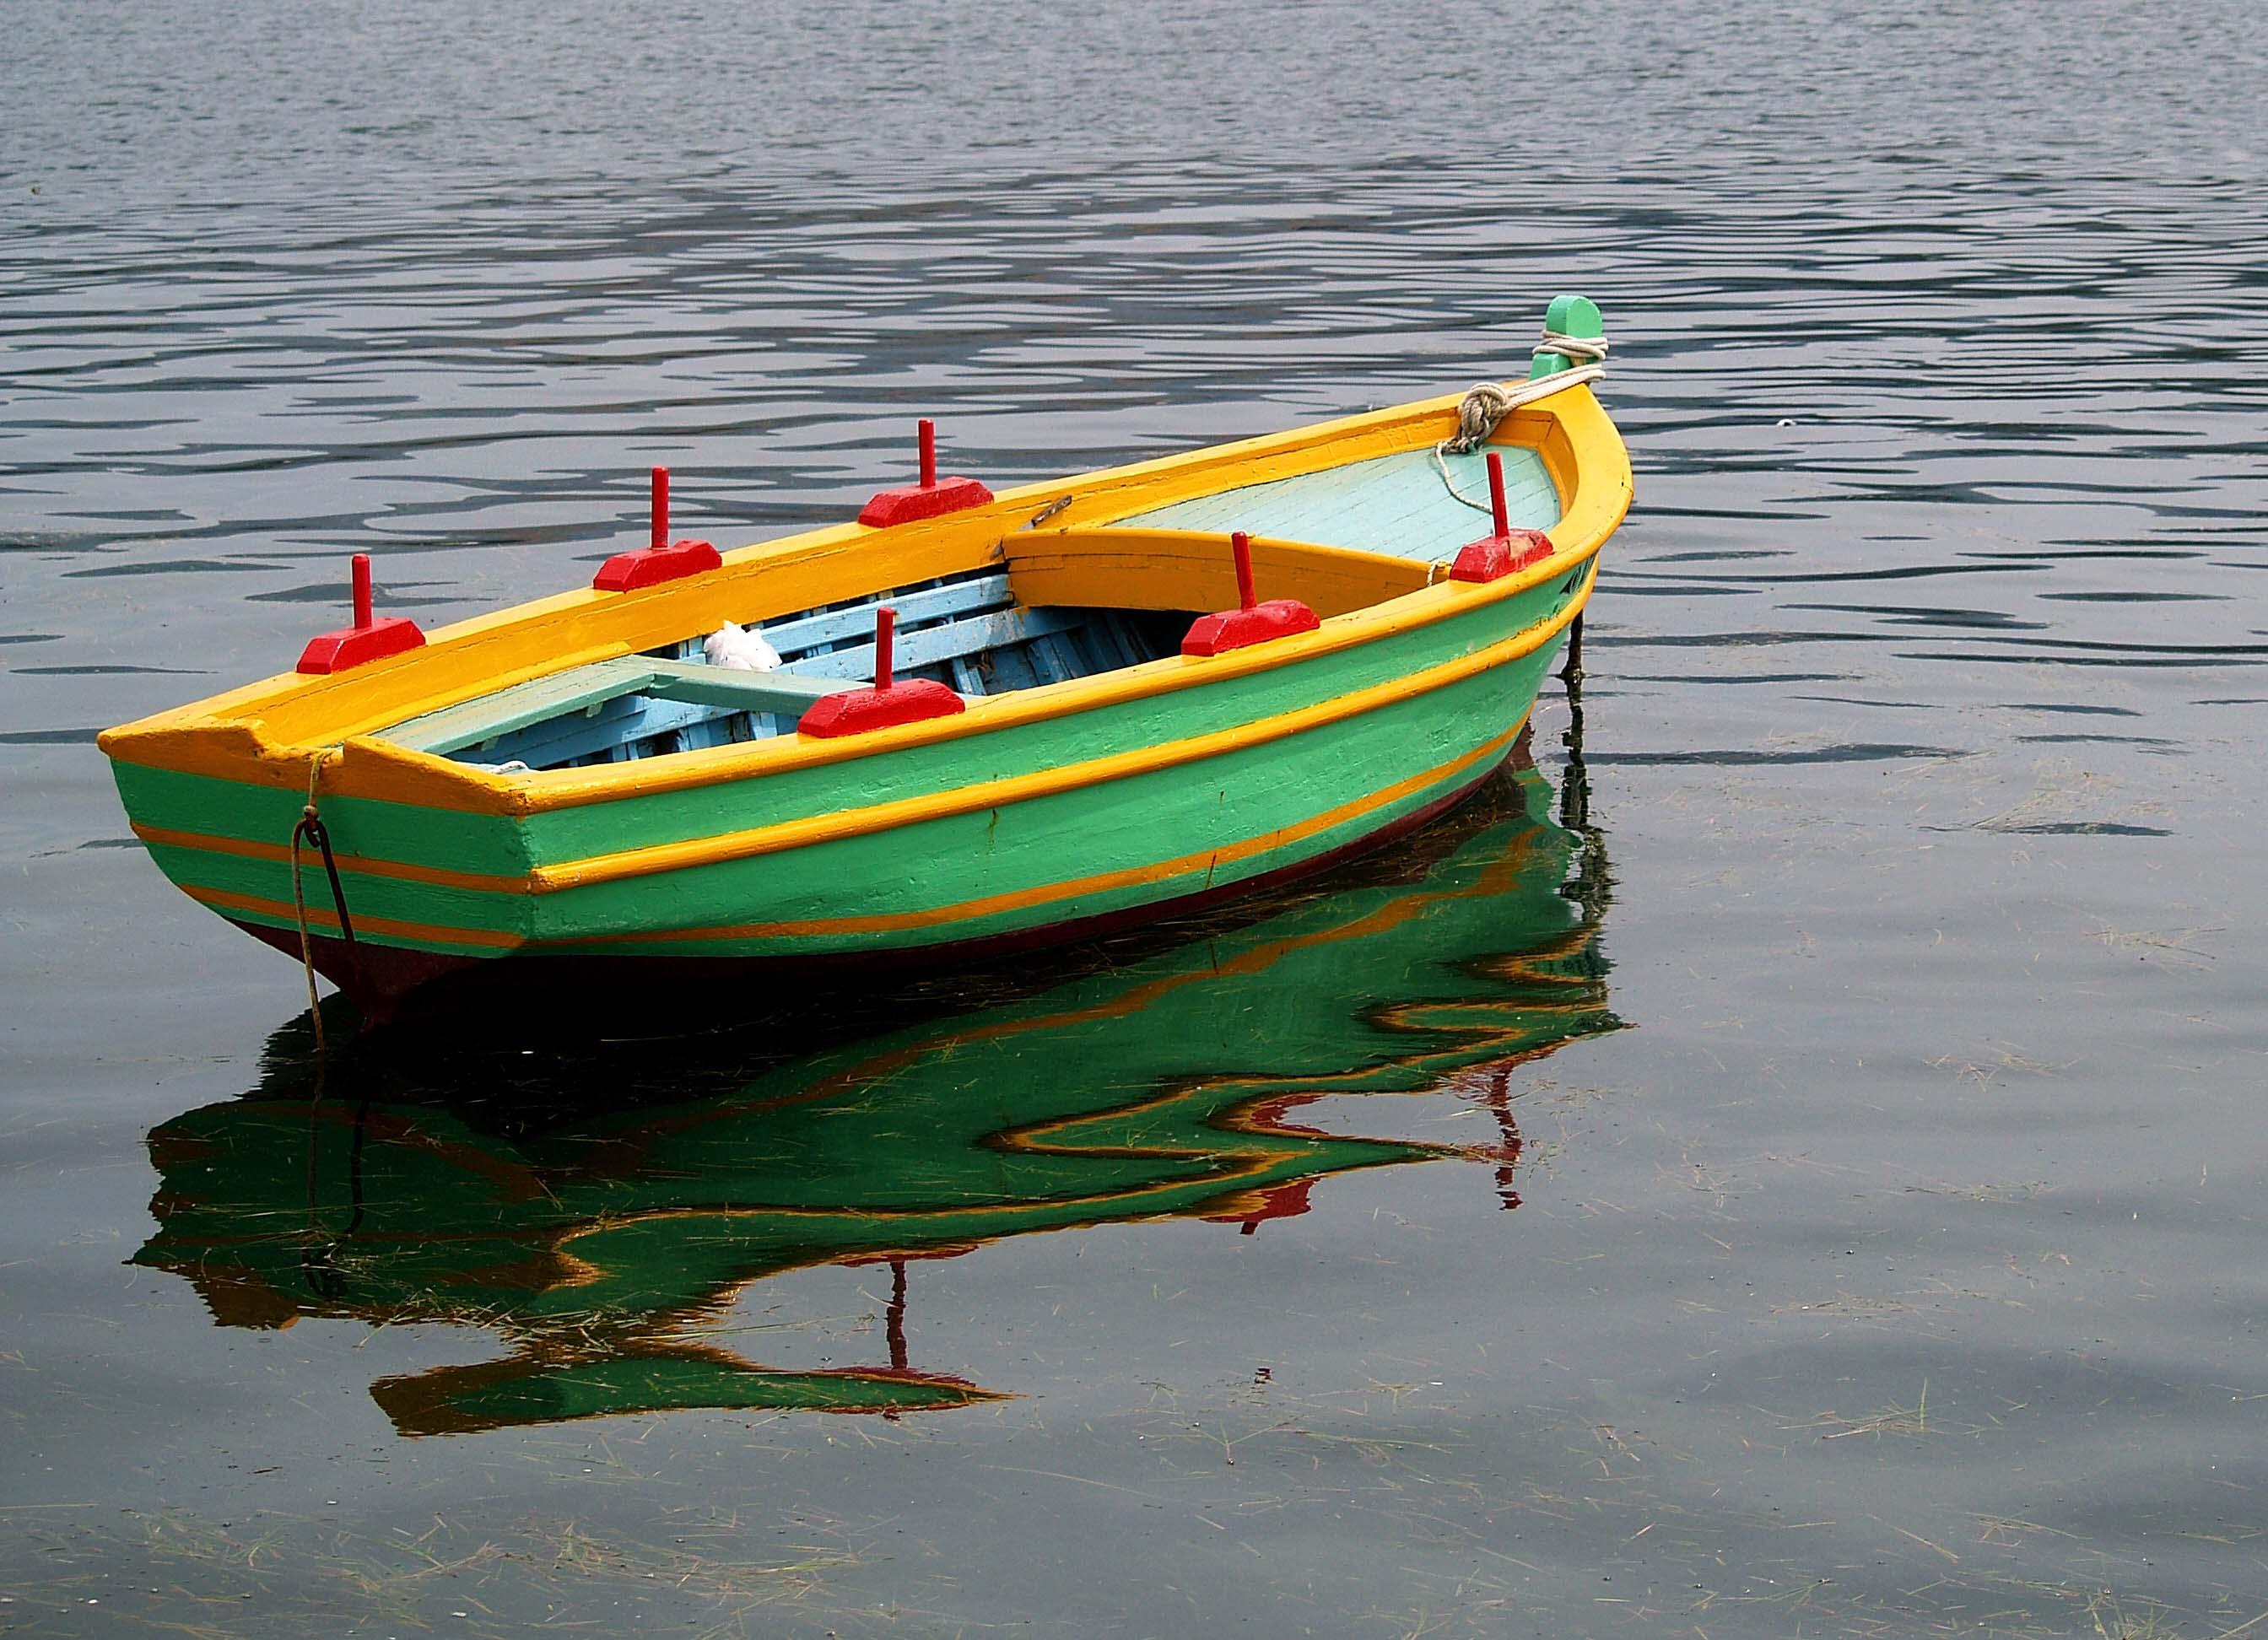 Wallpaper : boat, reflection, superhero, Greece, eye, skiff